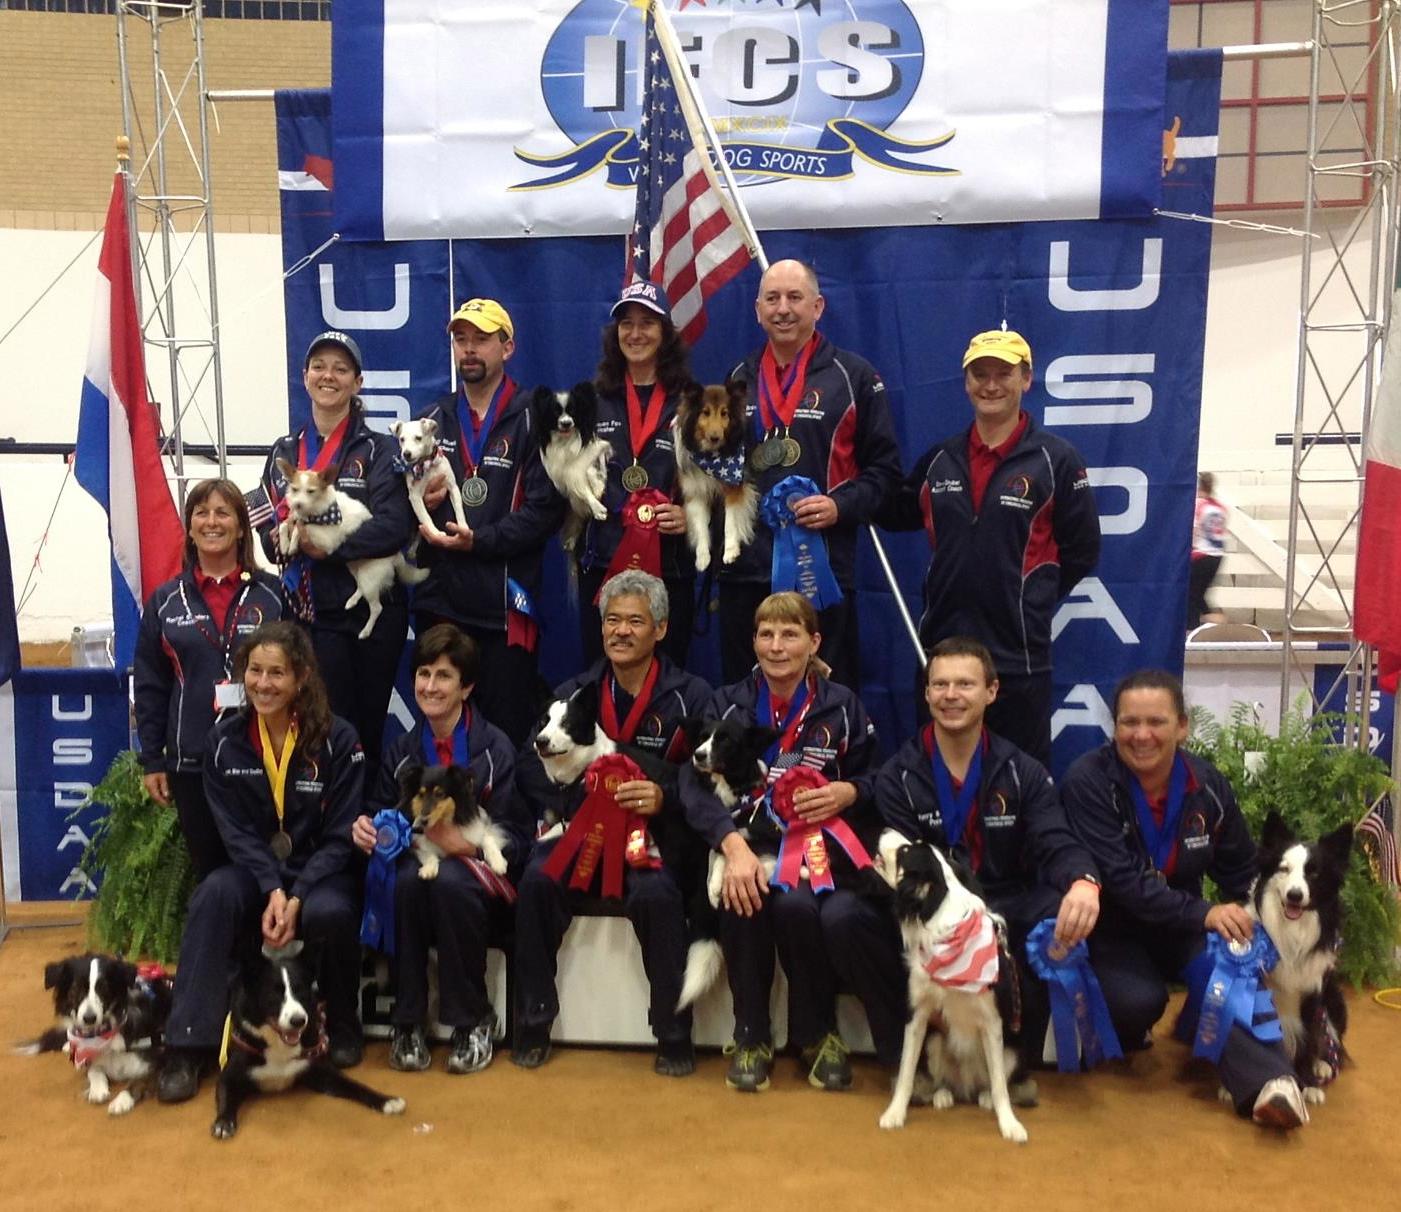 2012 IFCS USA World Team Members